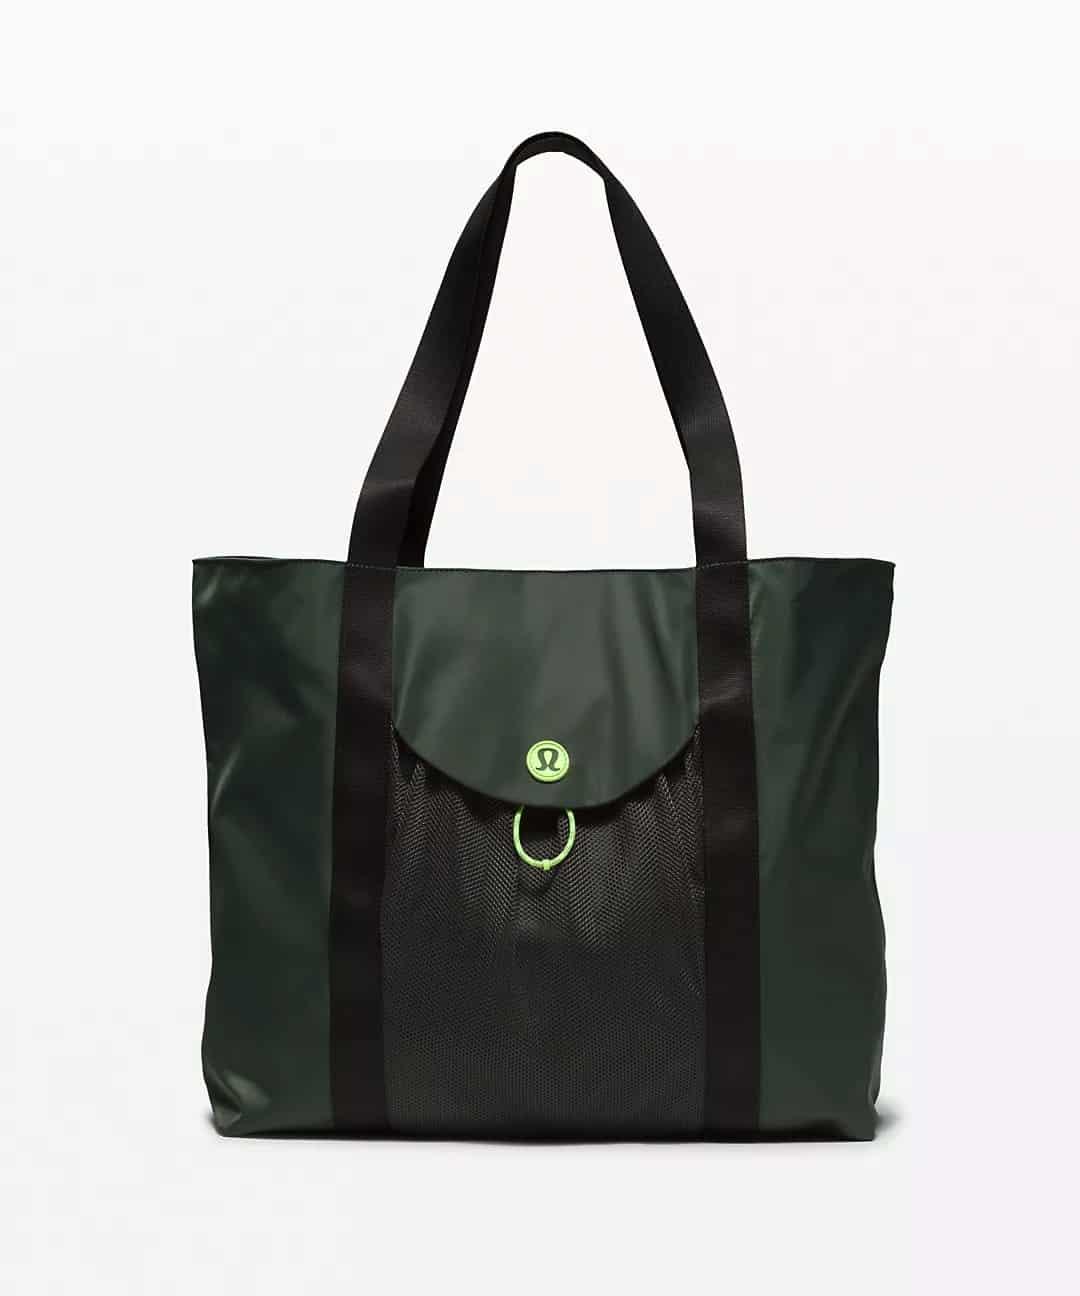 Take it On Tote Bag 24L   Bags   lululemon